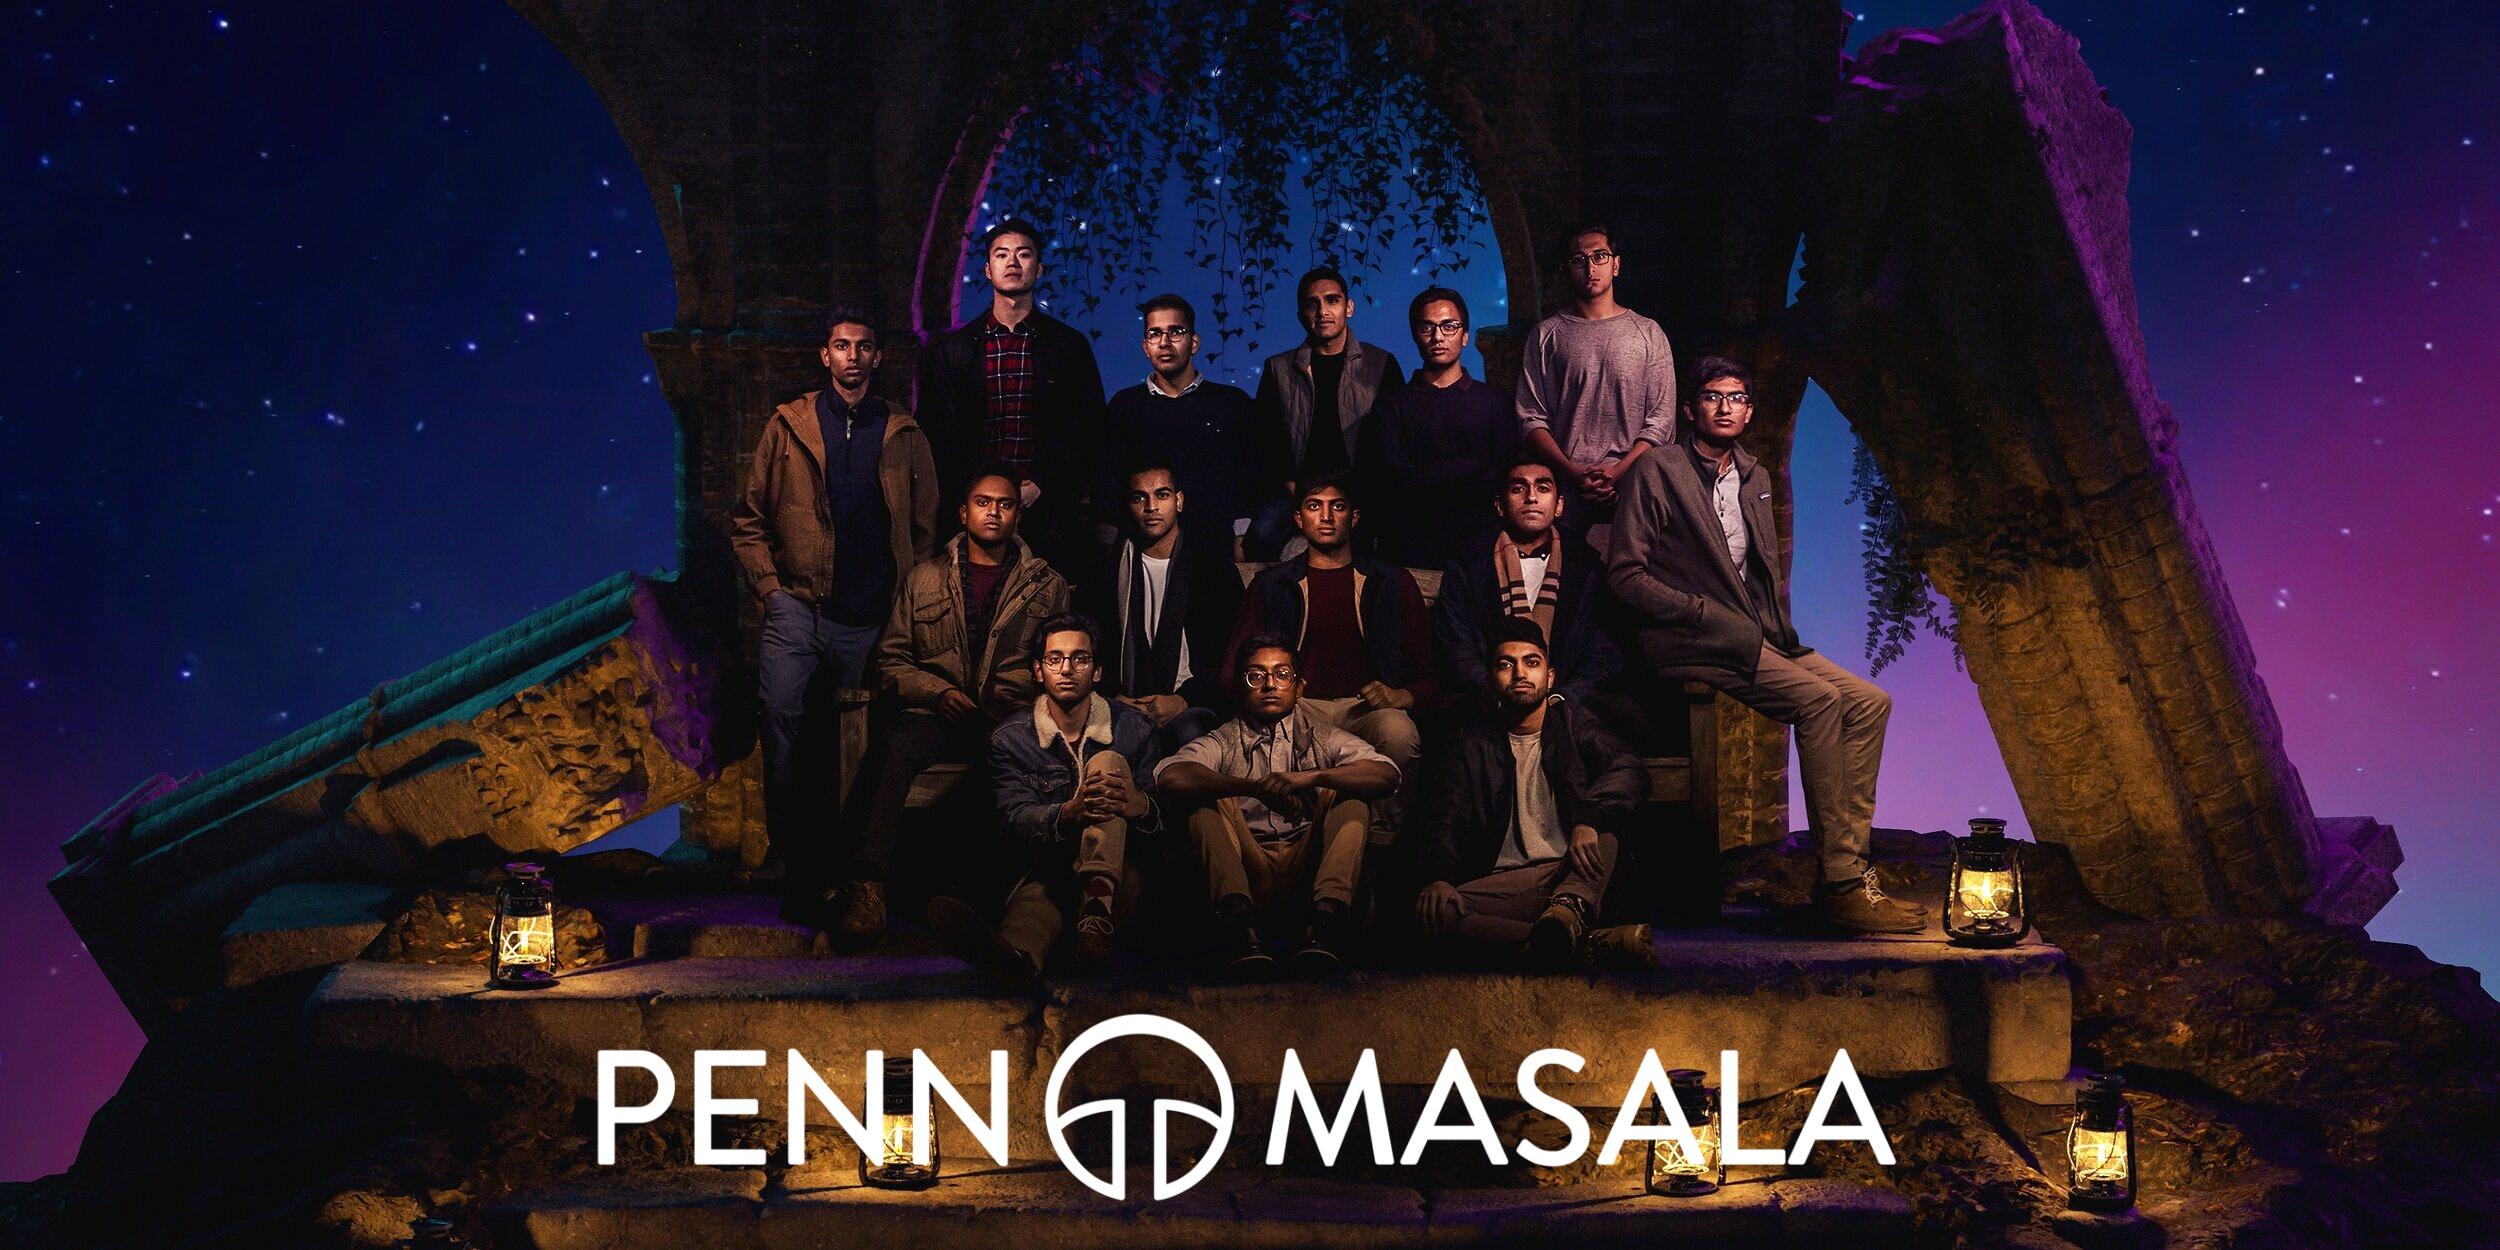 Penn Masala Band